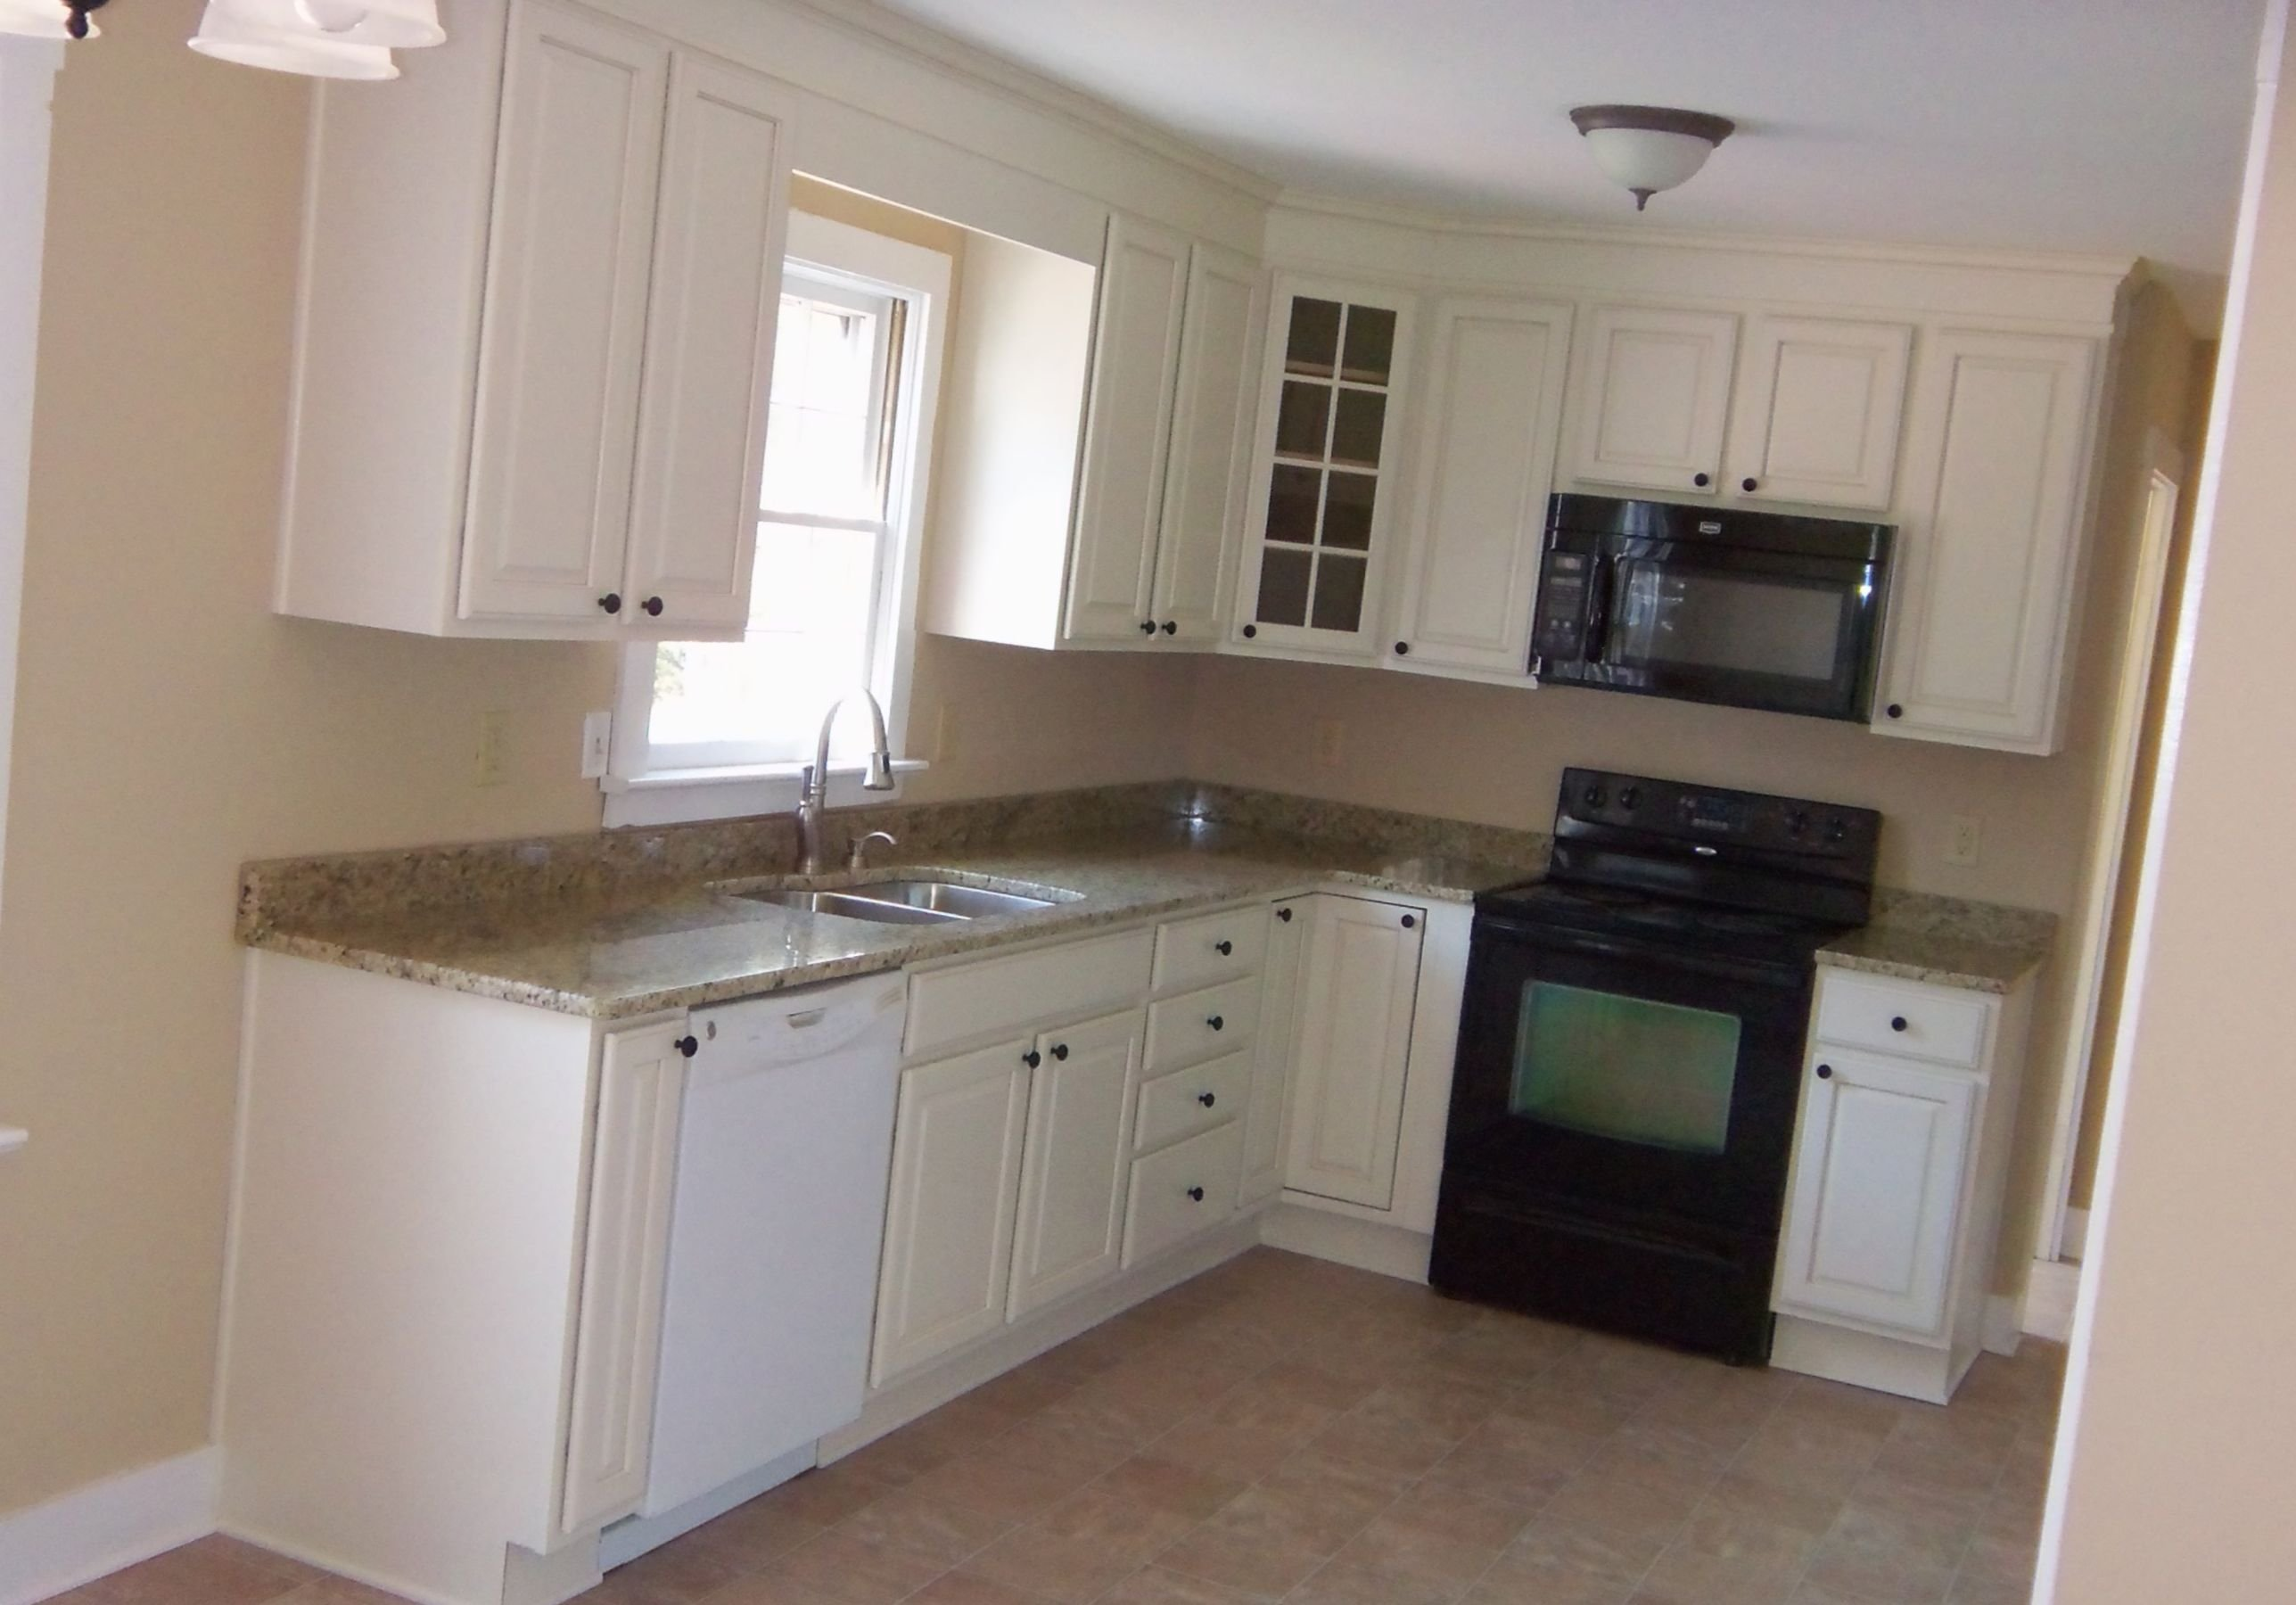 10 Pretty L Shaped Kitchen Design Ideas best of construct small l shaped kitchen designs layouts label 2020